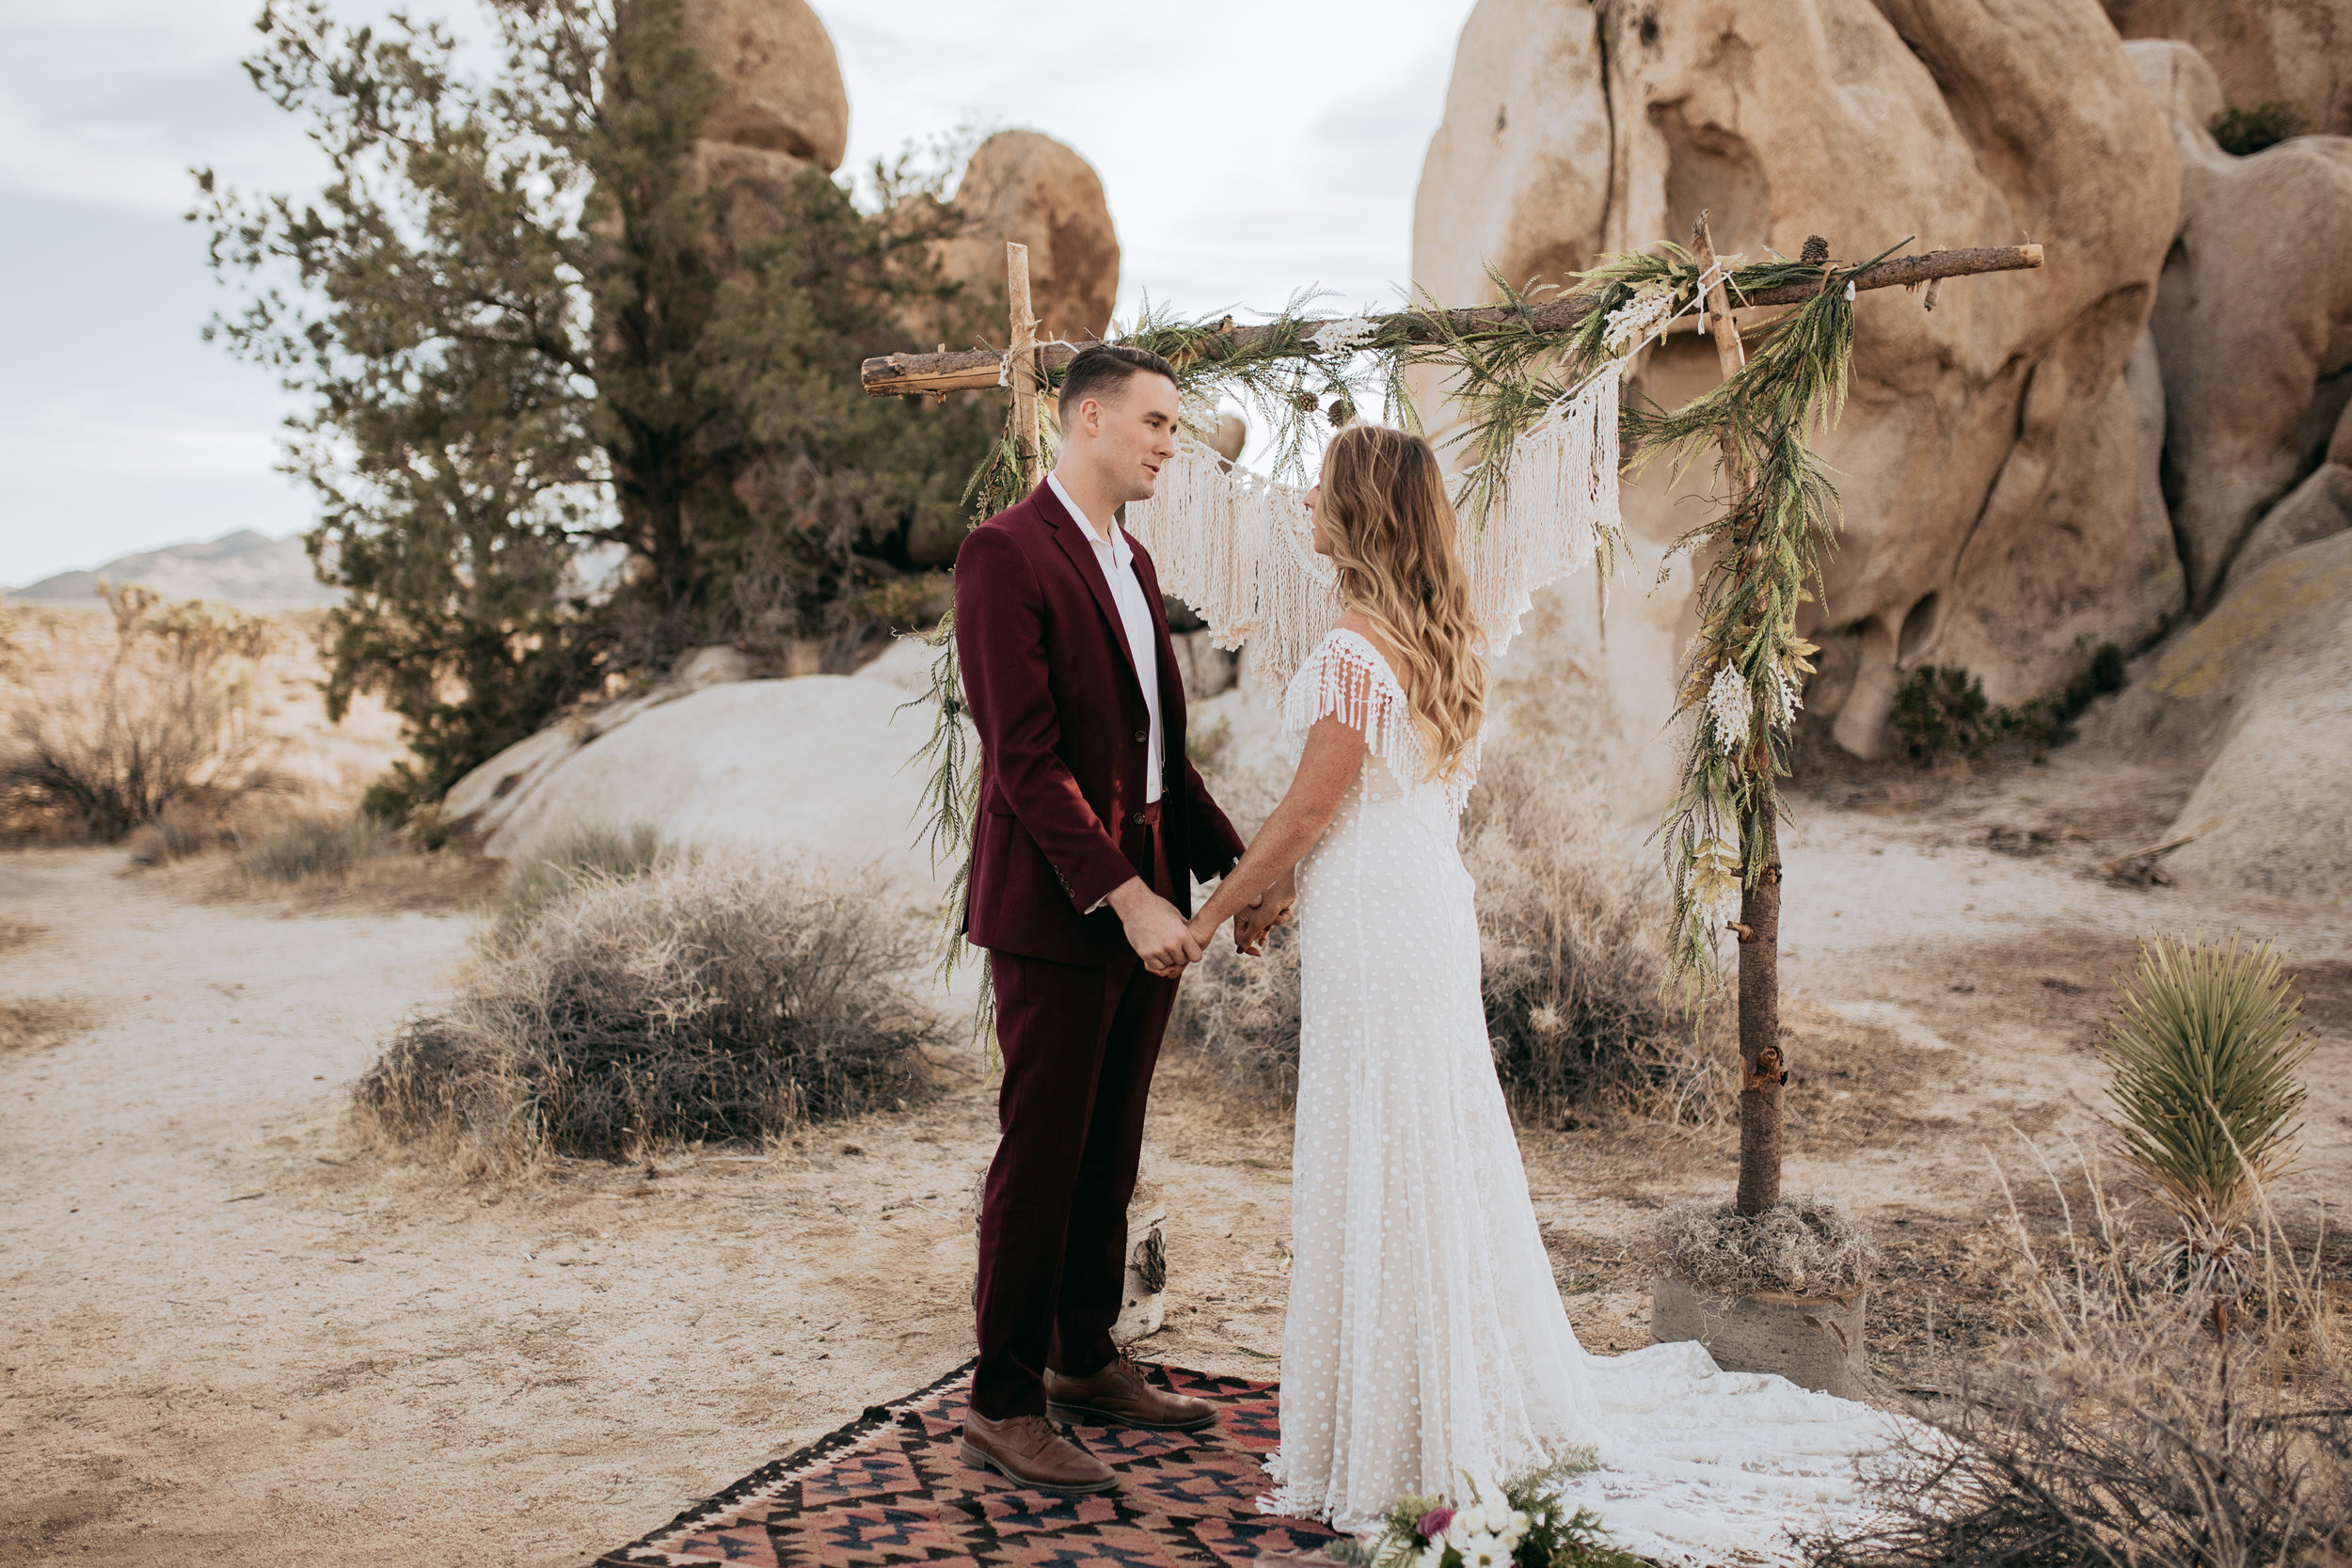 palmsprings_joshuatree_california_wedding_photographer-12.jpg